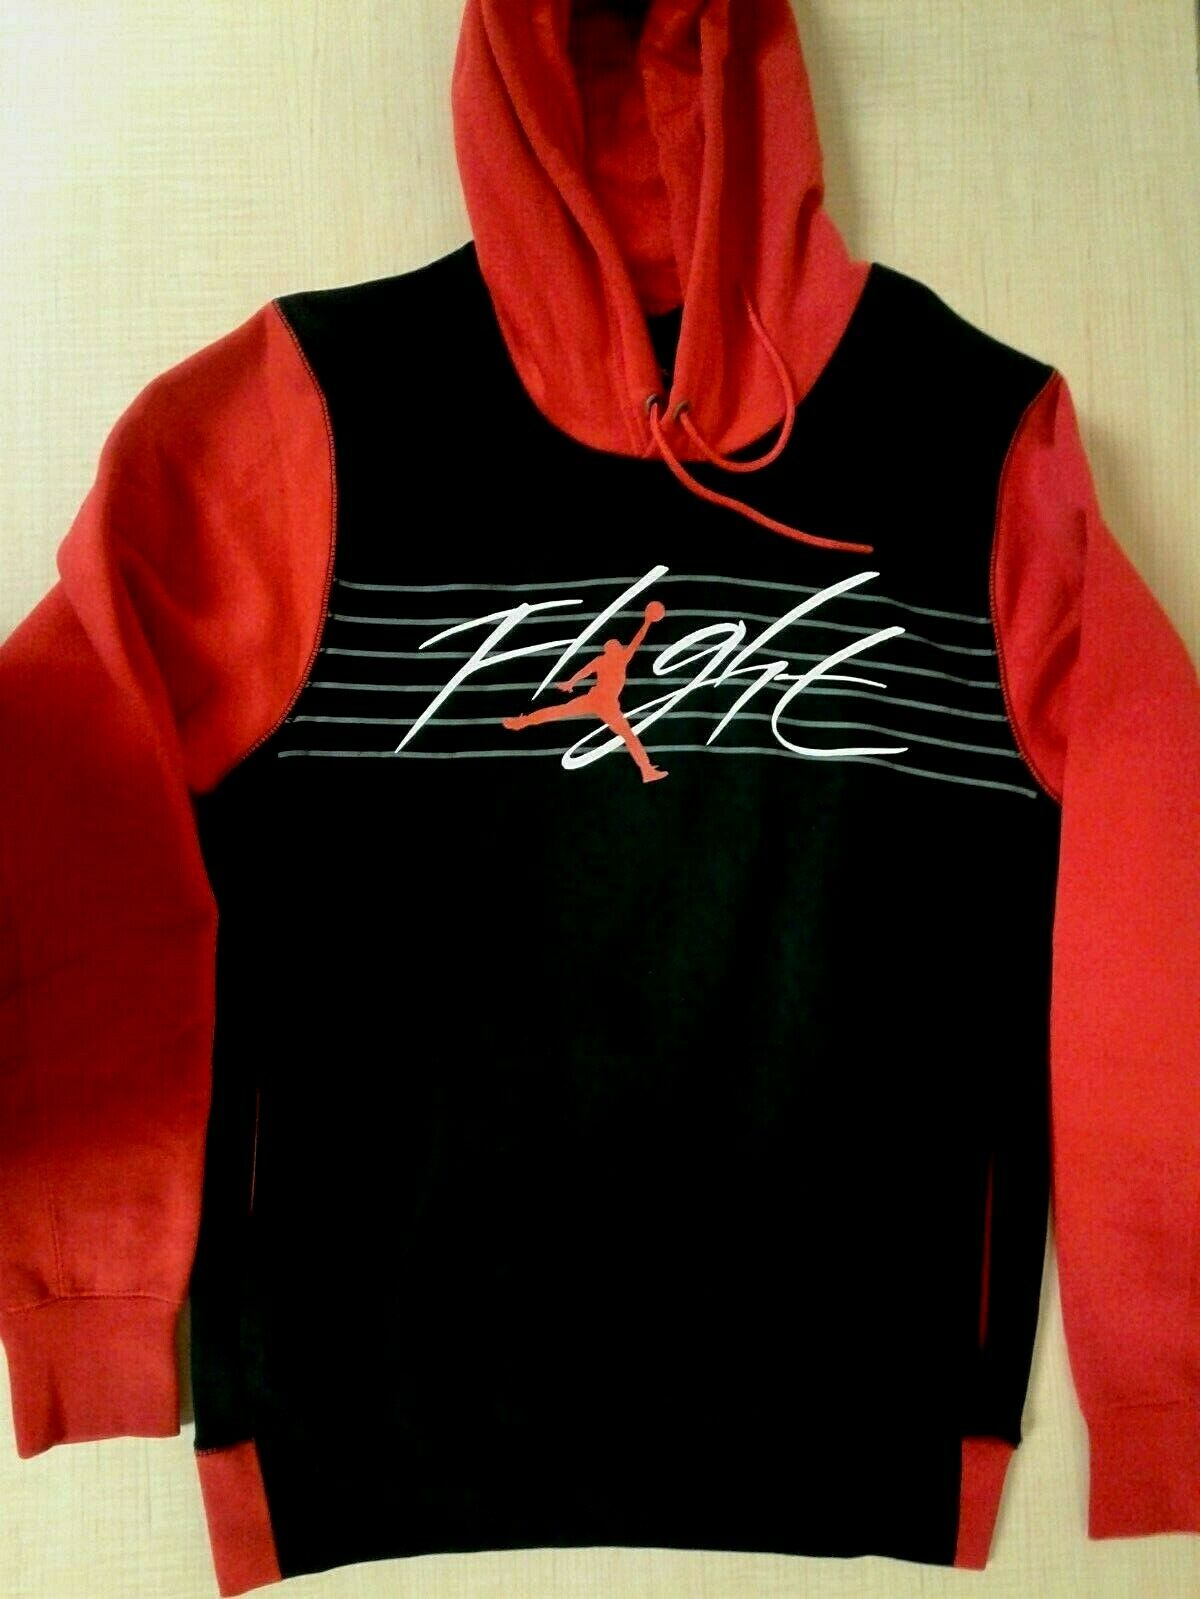 Original Nike Air Jordan Rot Schwarz Pullover Fleece Kapuzenpullover 930525-658